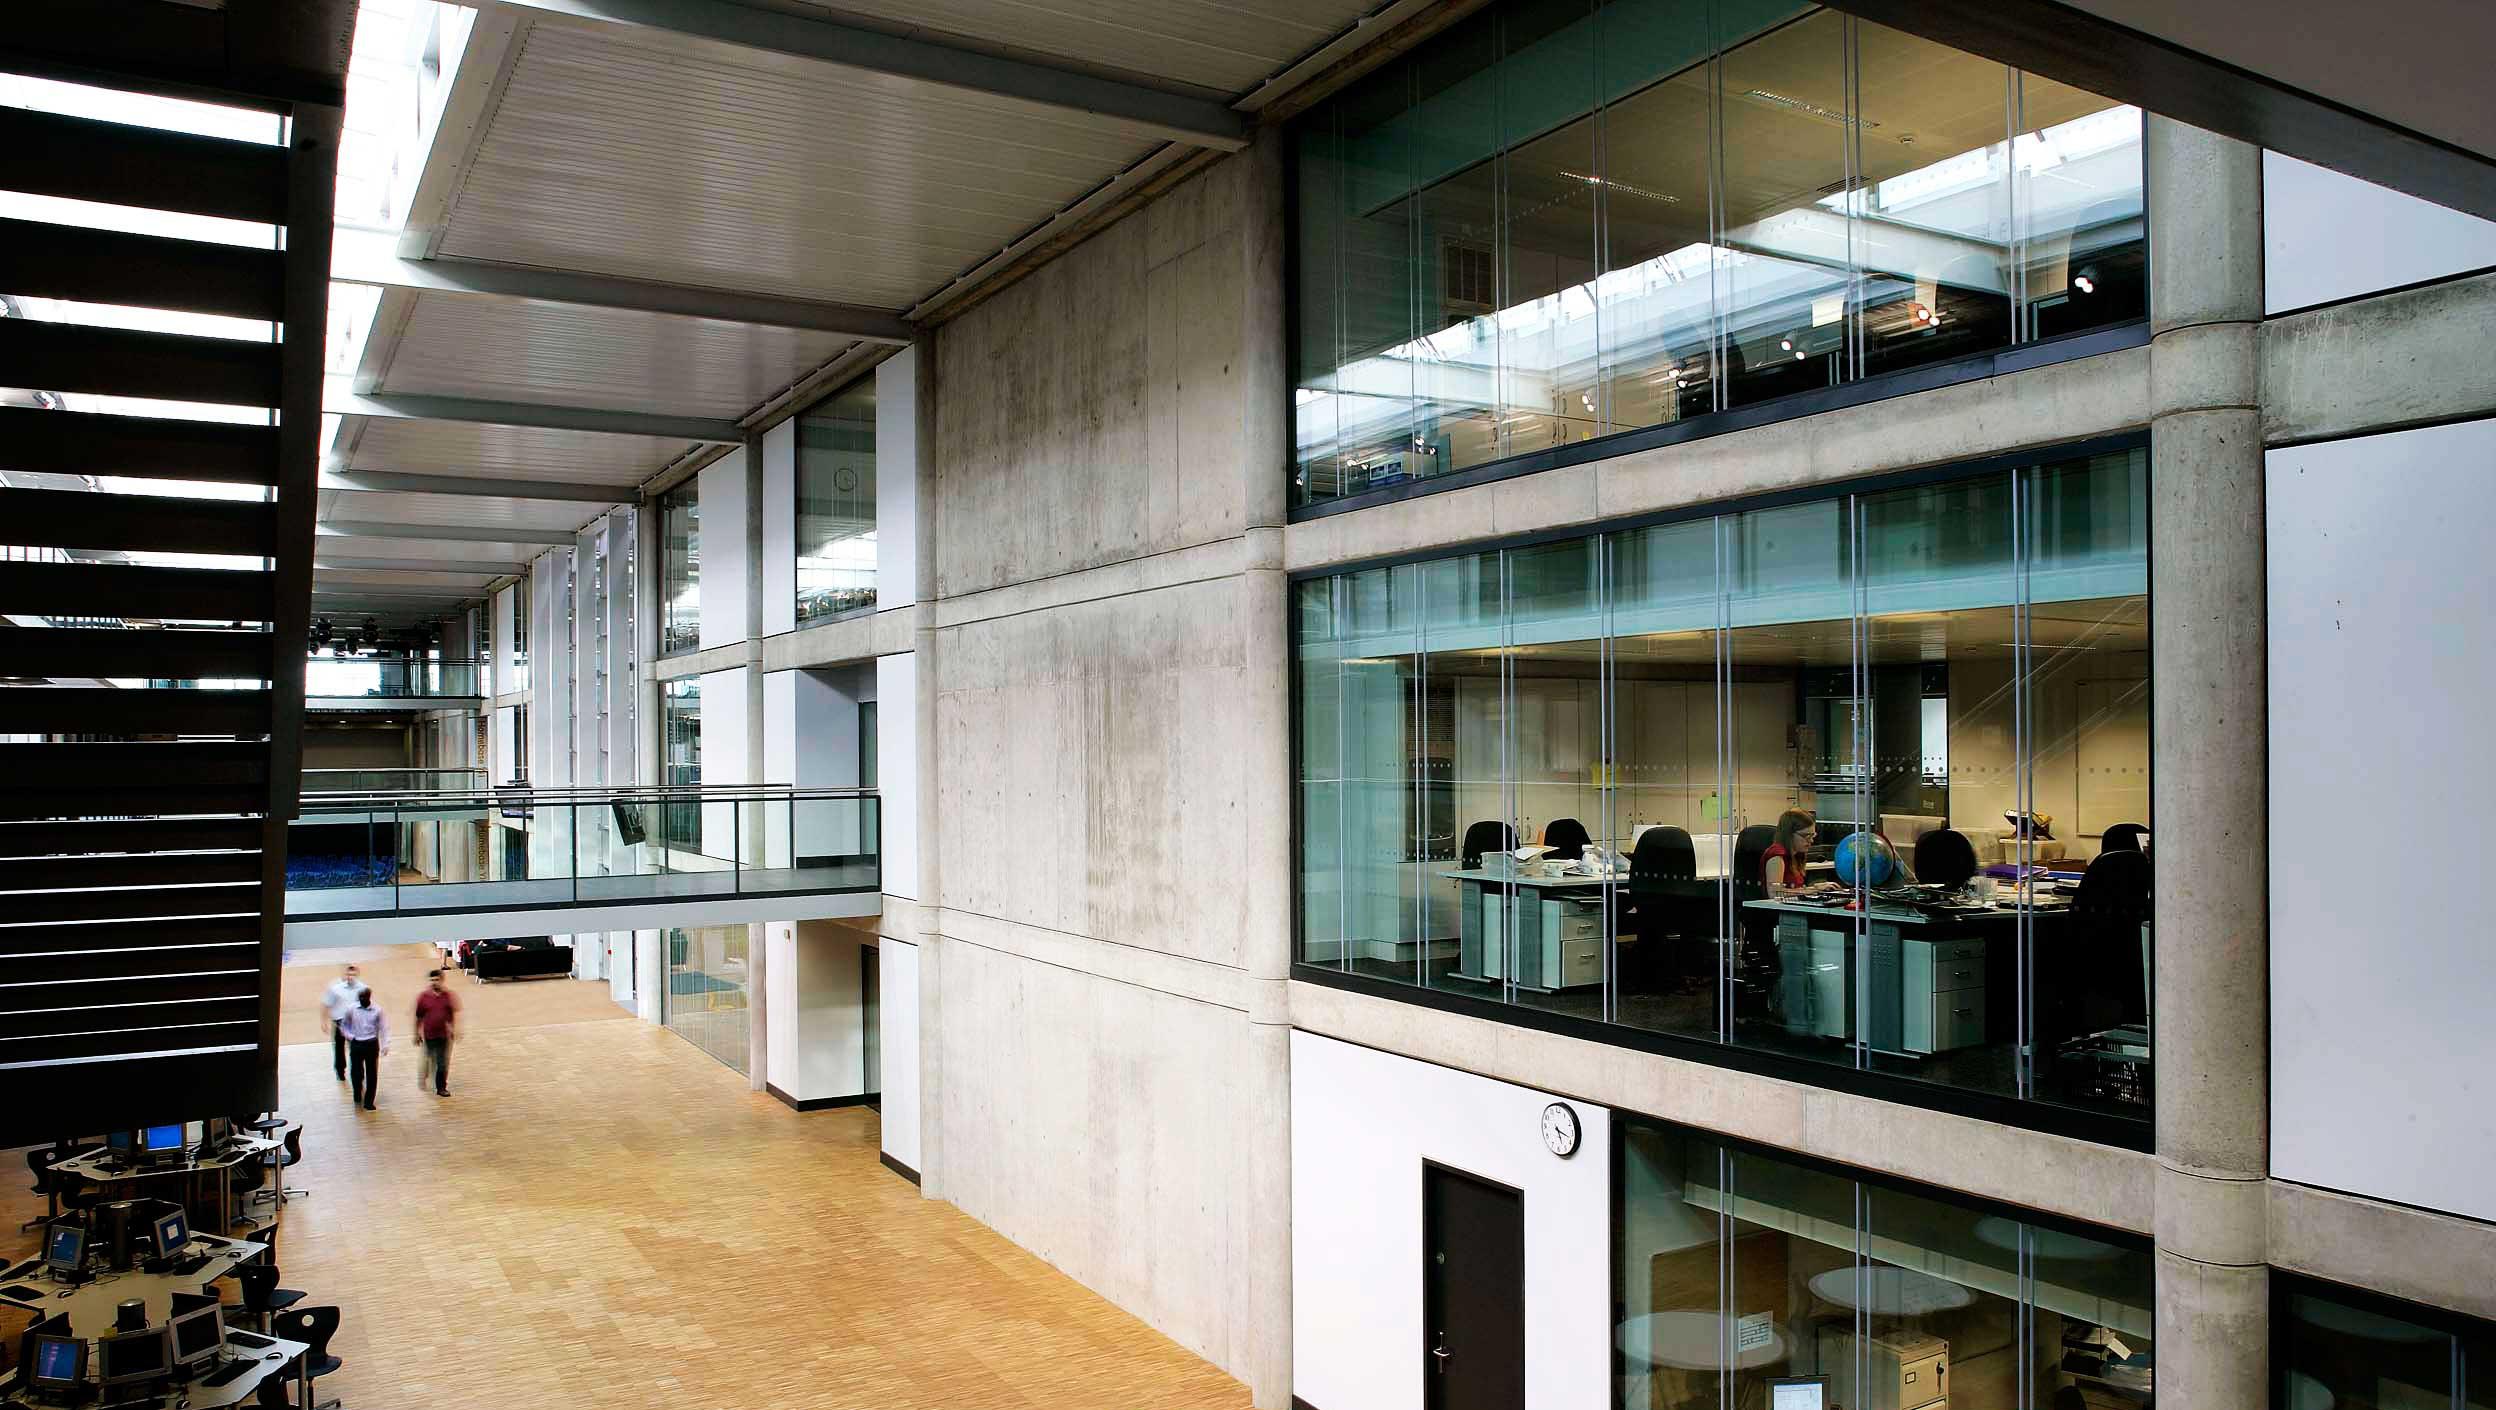 Glass Walls to Break up Concrete Architecture